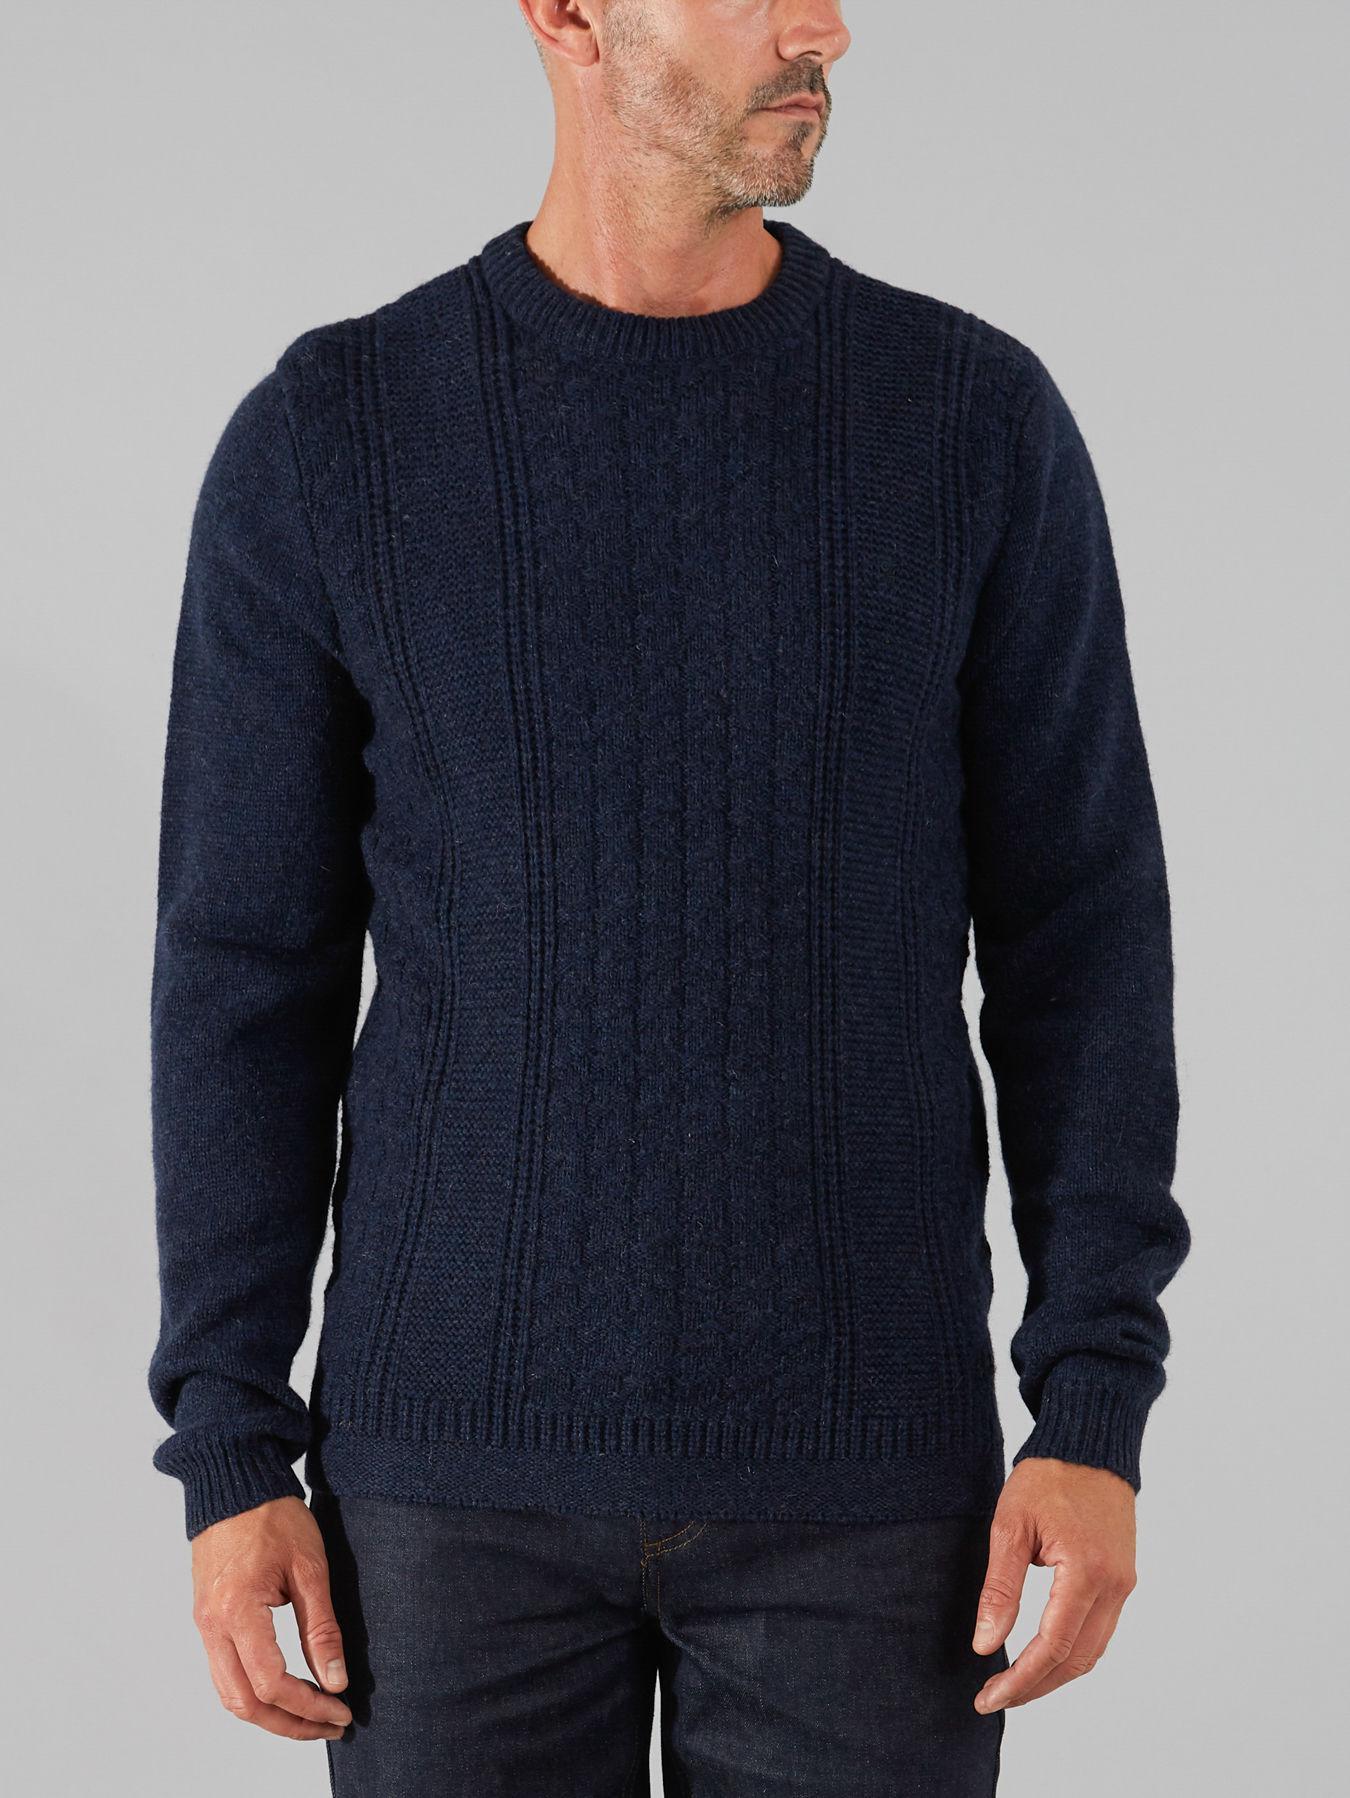 Farah Wool The Chelmorton Cable Crew in Dark Navy Marl (Blue) for Men